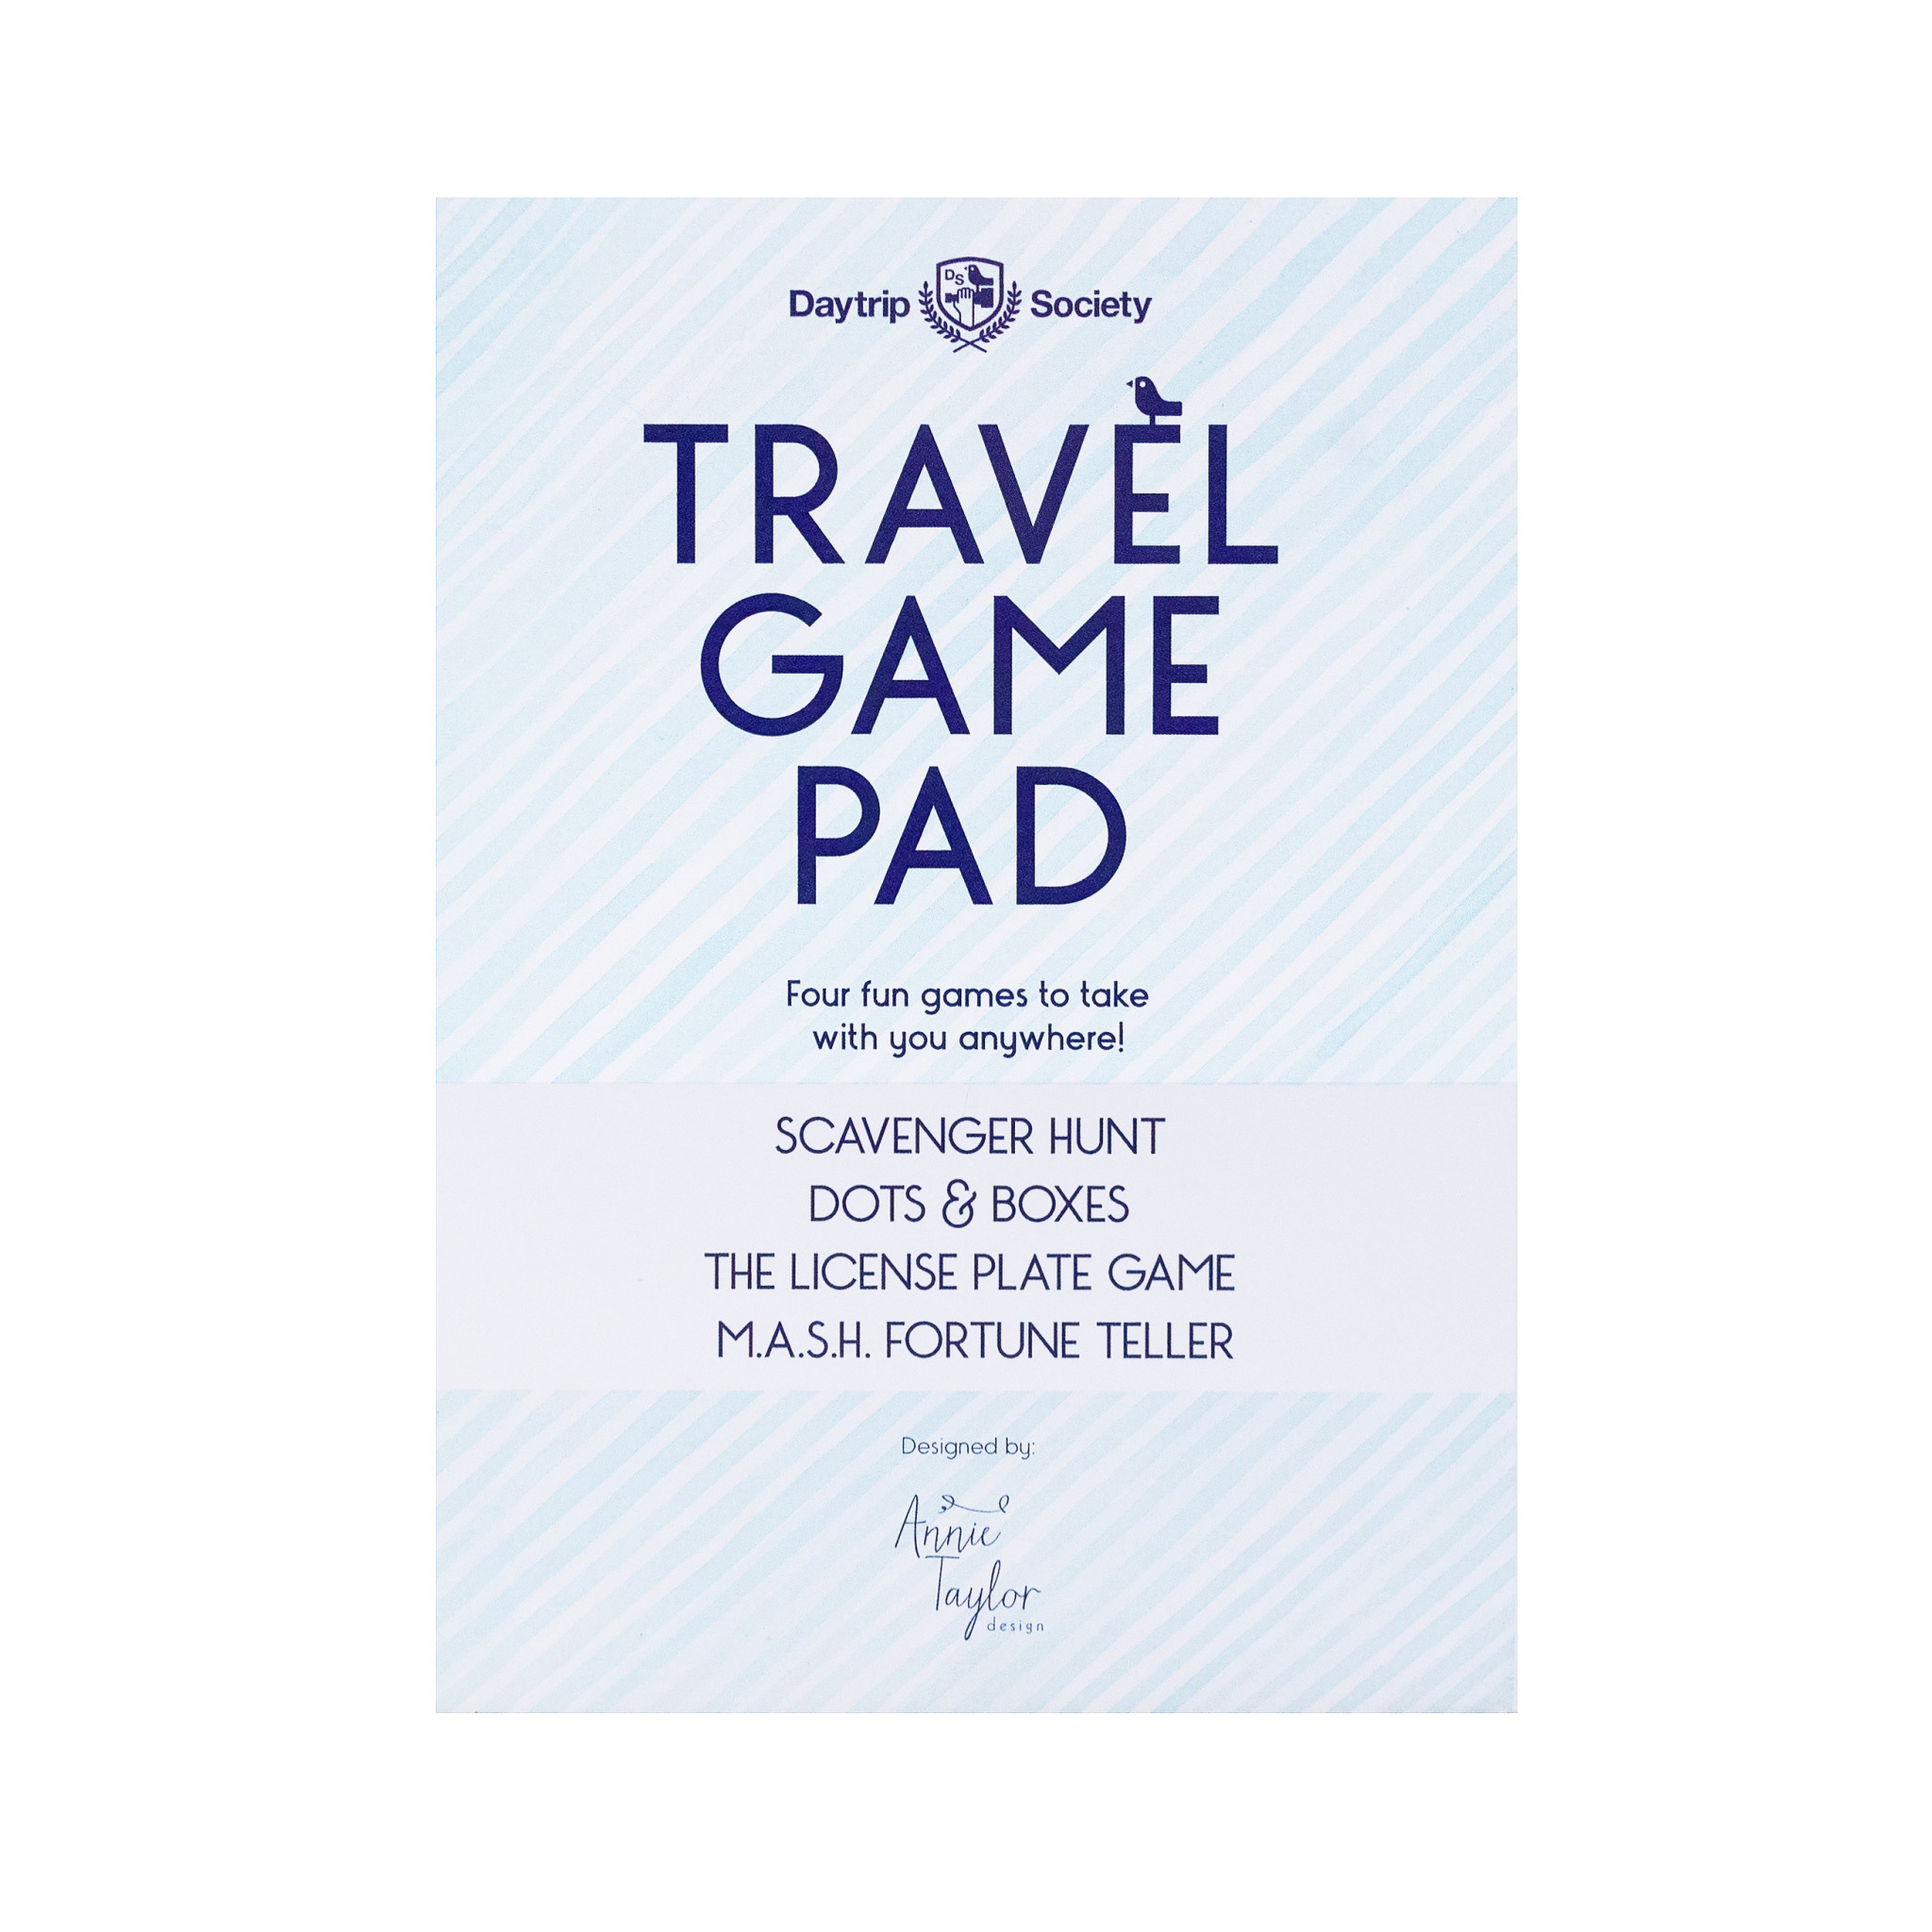 Daytrip Society Travel Game Pad